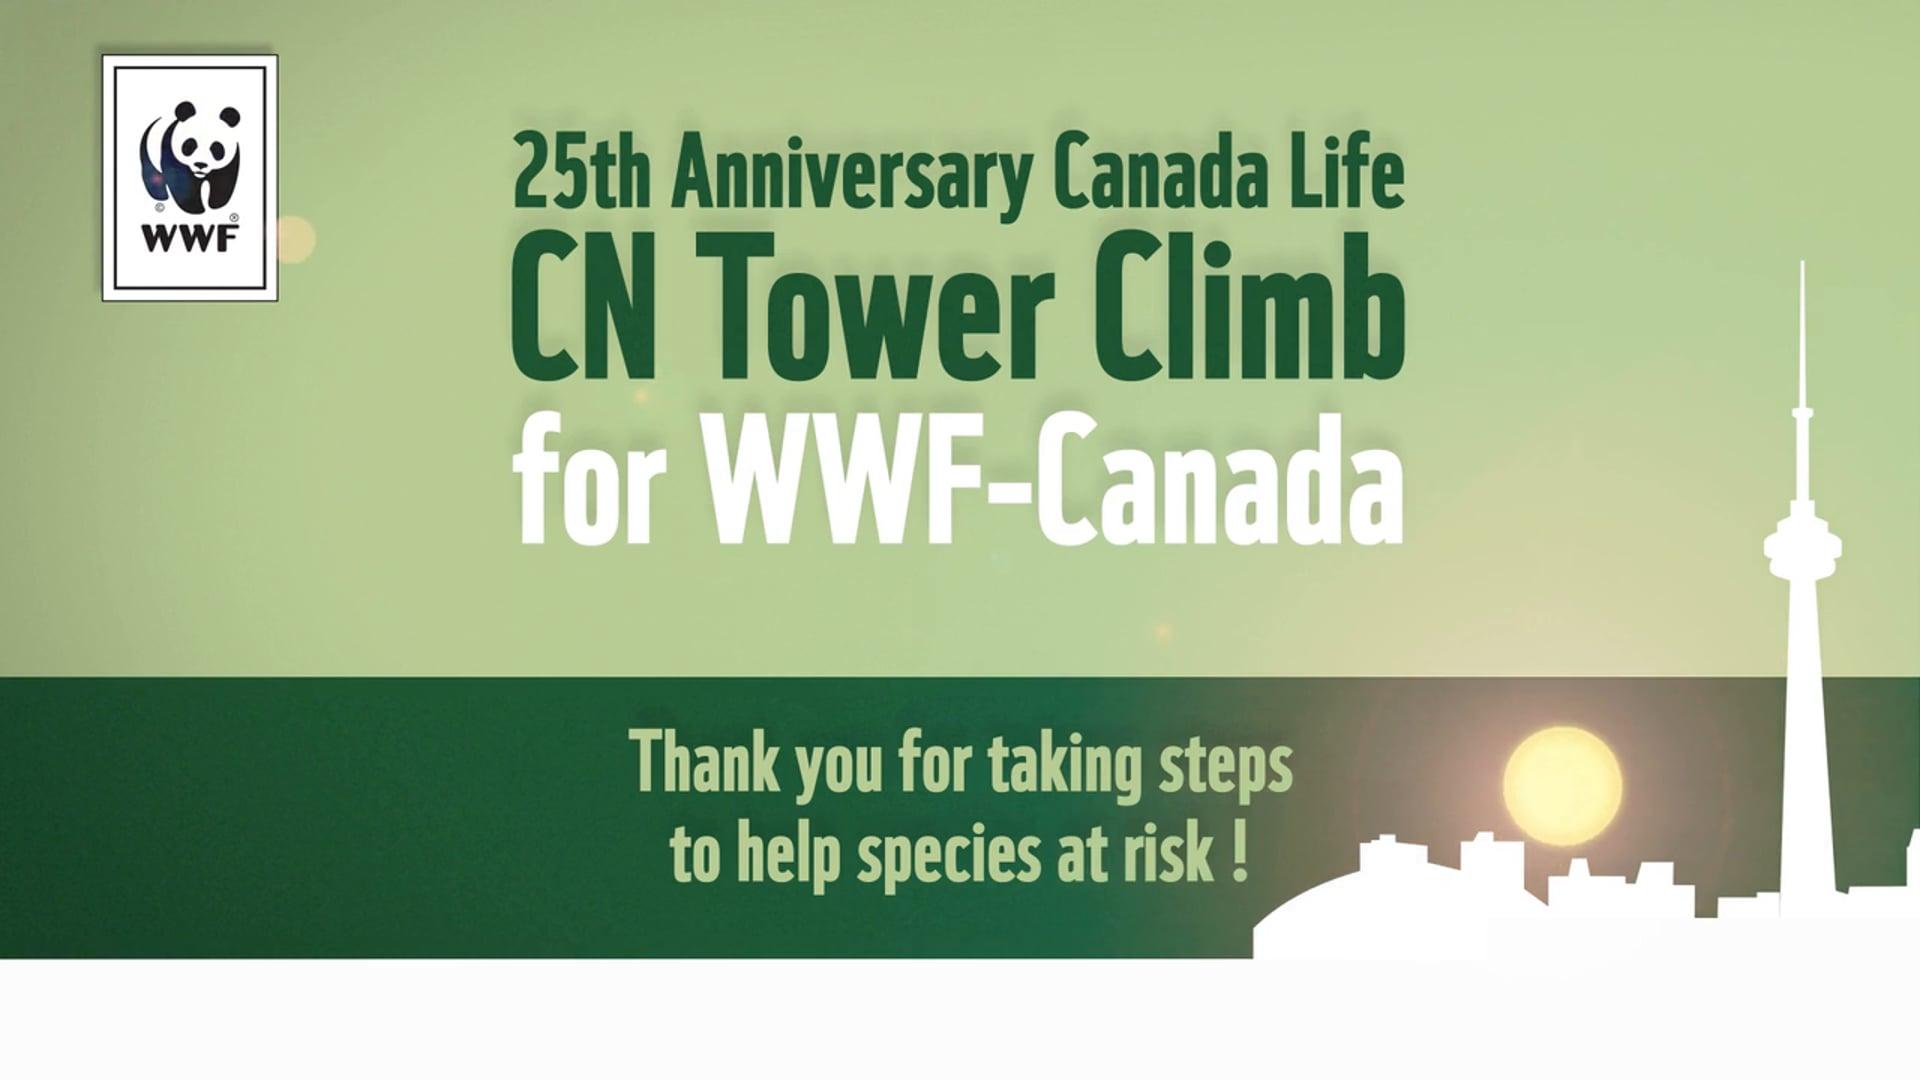 WWF Tower Climb